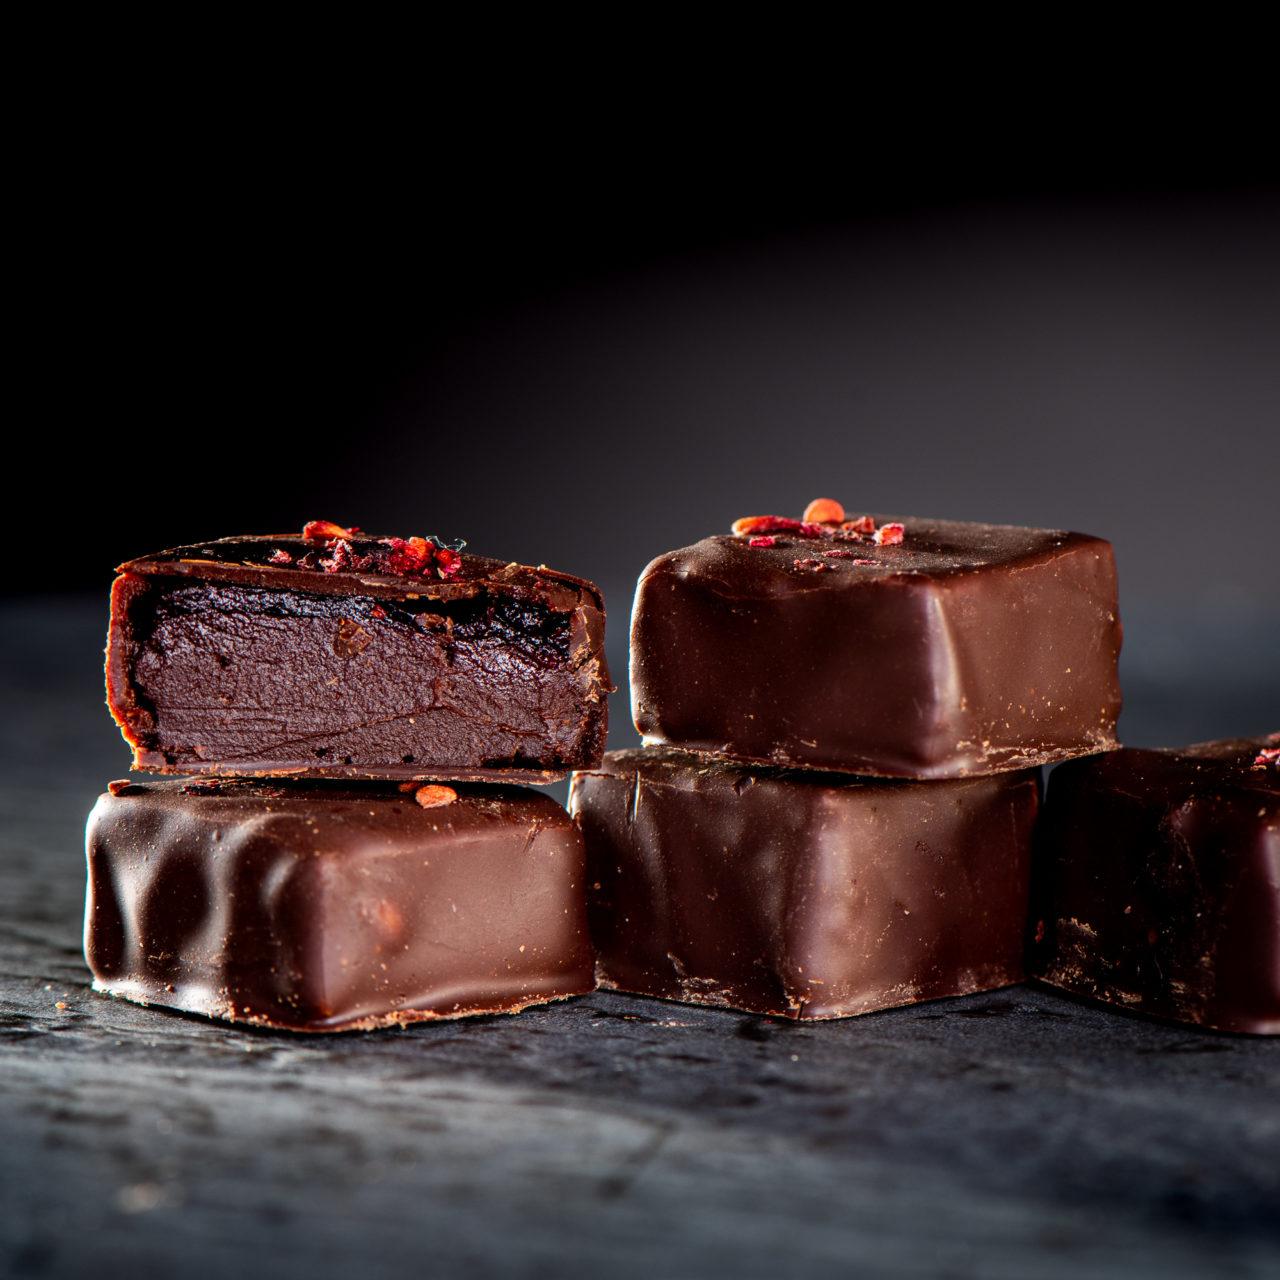 chocolat noir aux fruits : Mandarine